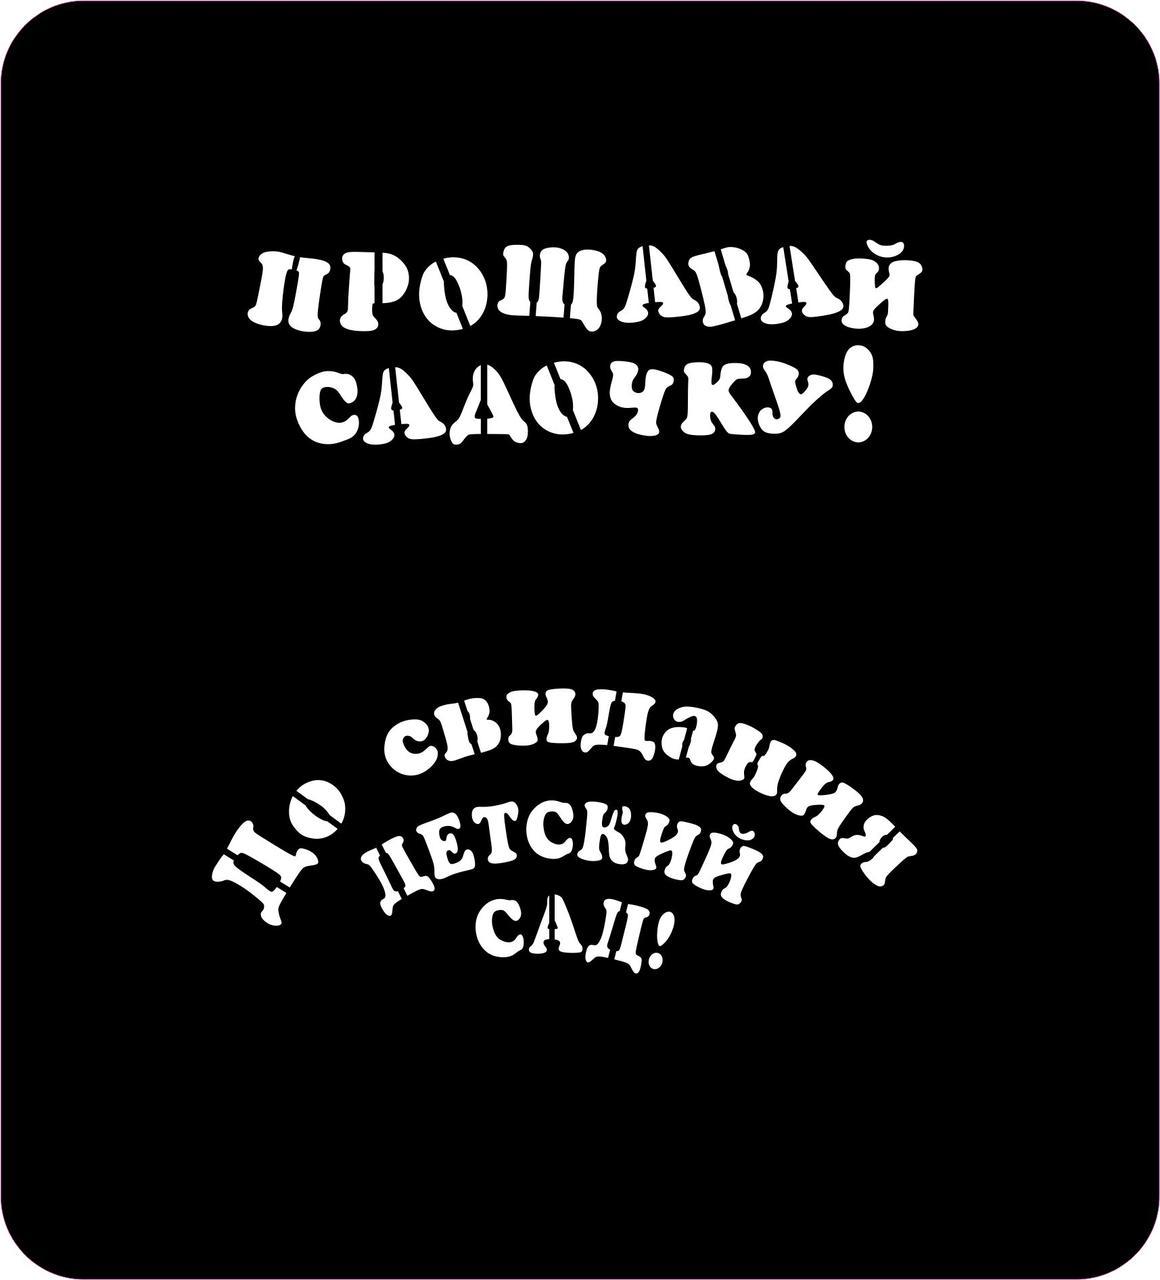 Трафарет Надписи детский сад №2